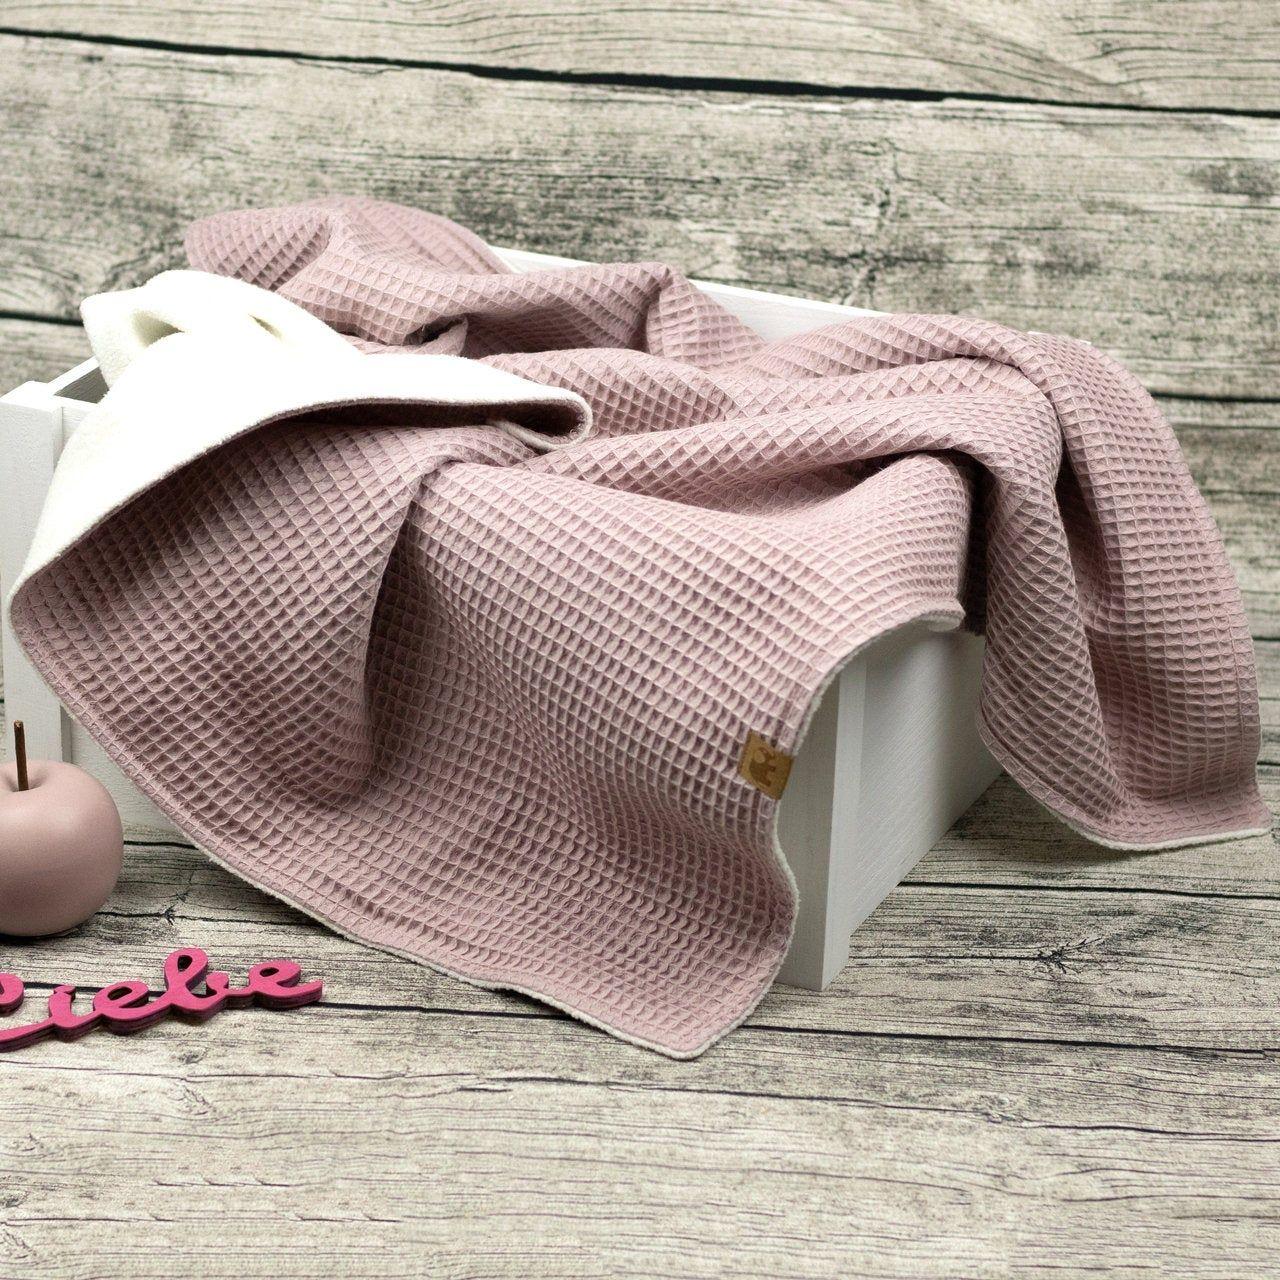 Soft Baby Blanket Cuddly Blanket Teddy Wafflelpique Cotton Fleece Crawlblanket Pram Blanket Blanket Baby Child Old Pink Pink In 2020 Soft Baby Blankets Cuddly Blanket Pram Blanket